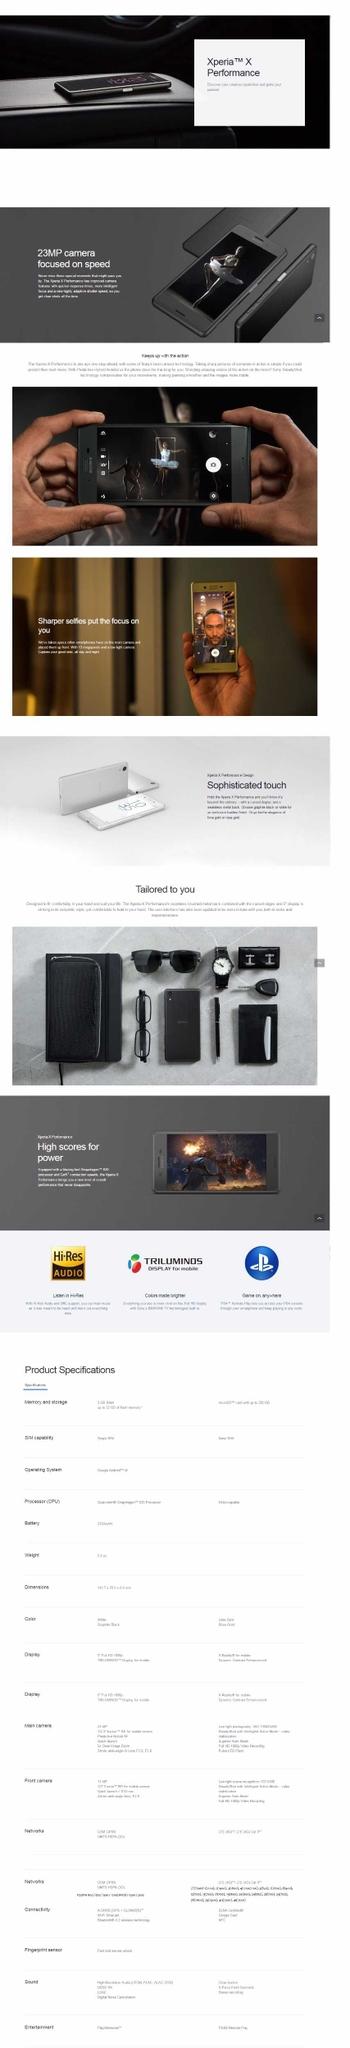 Sony Xperia X Performance Dual Sim (3GB. 64GB)   Black price in Nigeria